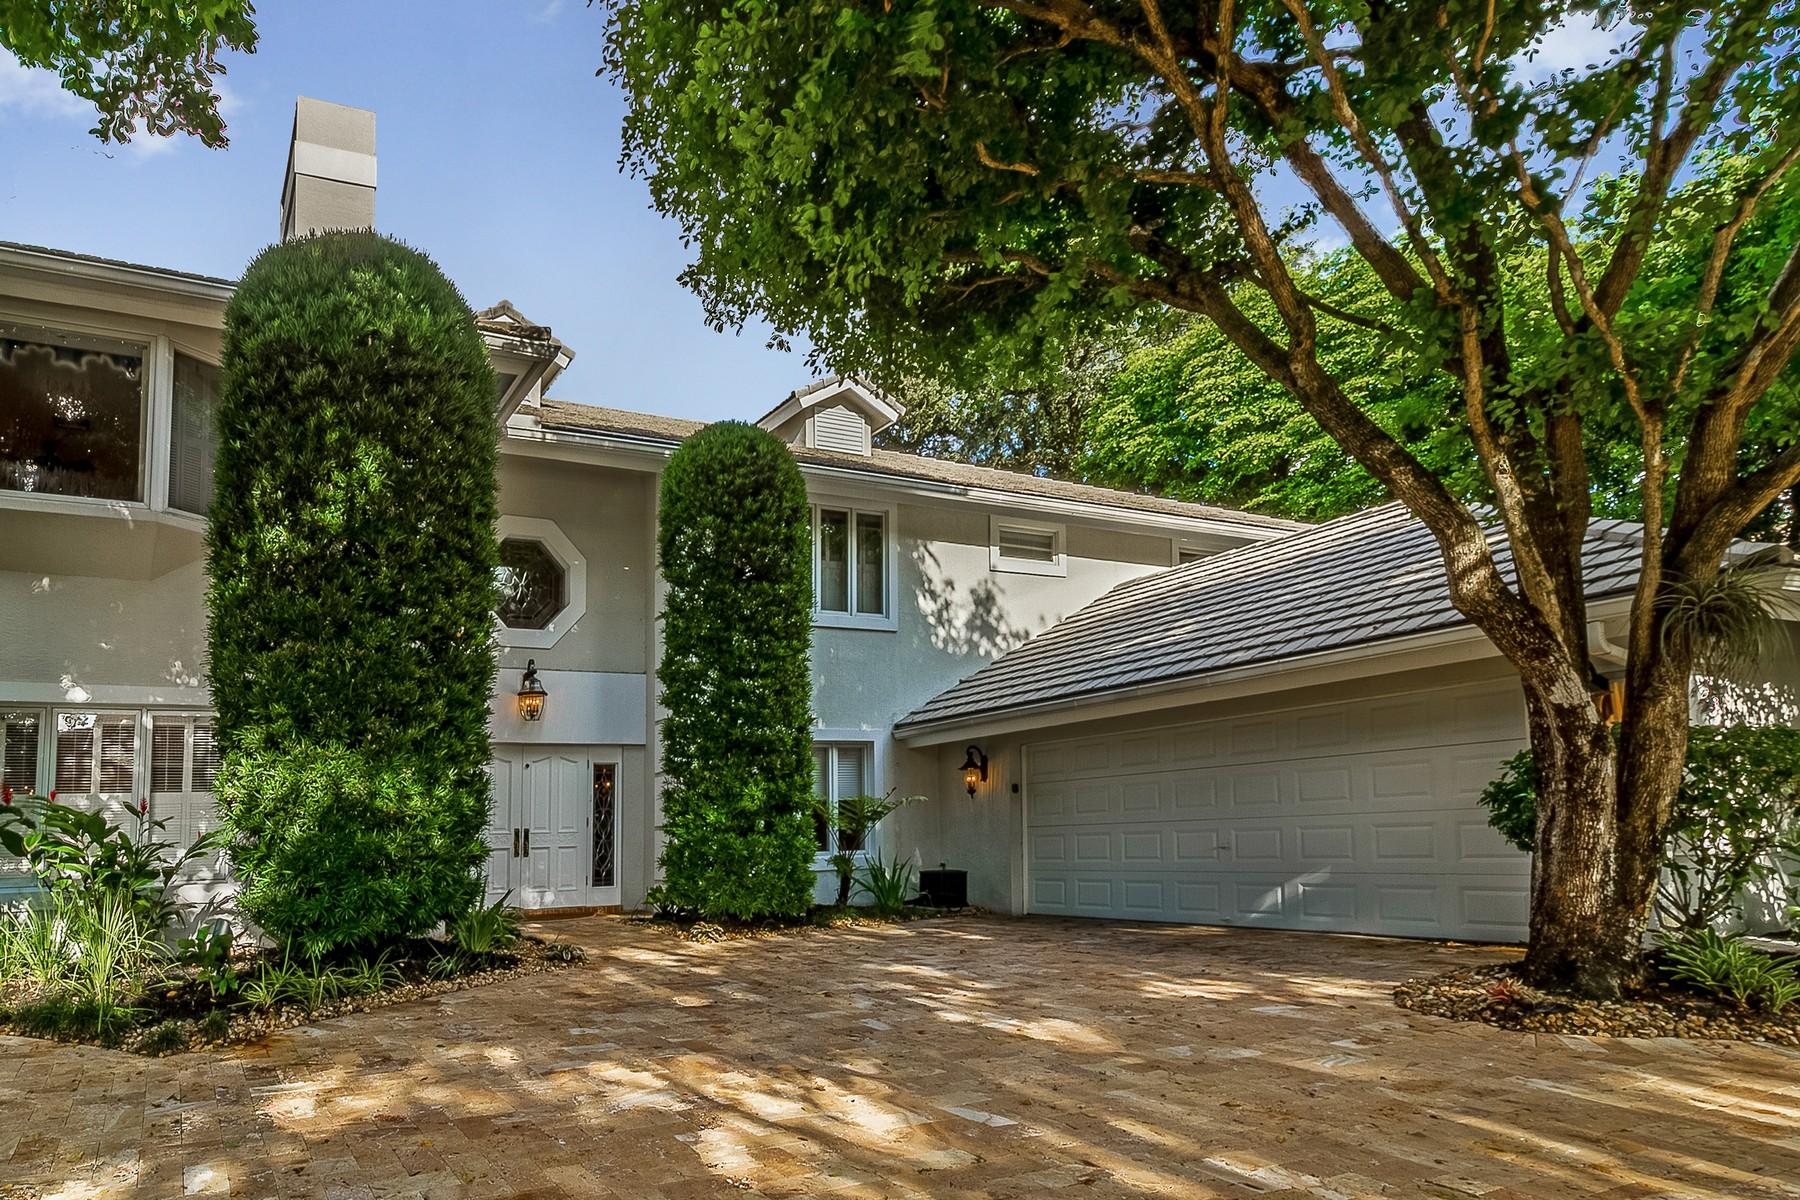 独户住宅 为 销售 在 3845 Kings Way , Boca Raton, FL 33434 3845 Kings Way Woodfield Hunt Club, 博卡拉顿, 佛罗里达州, 33434 美国